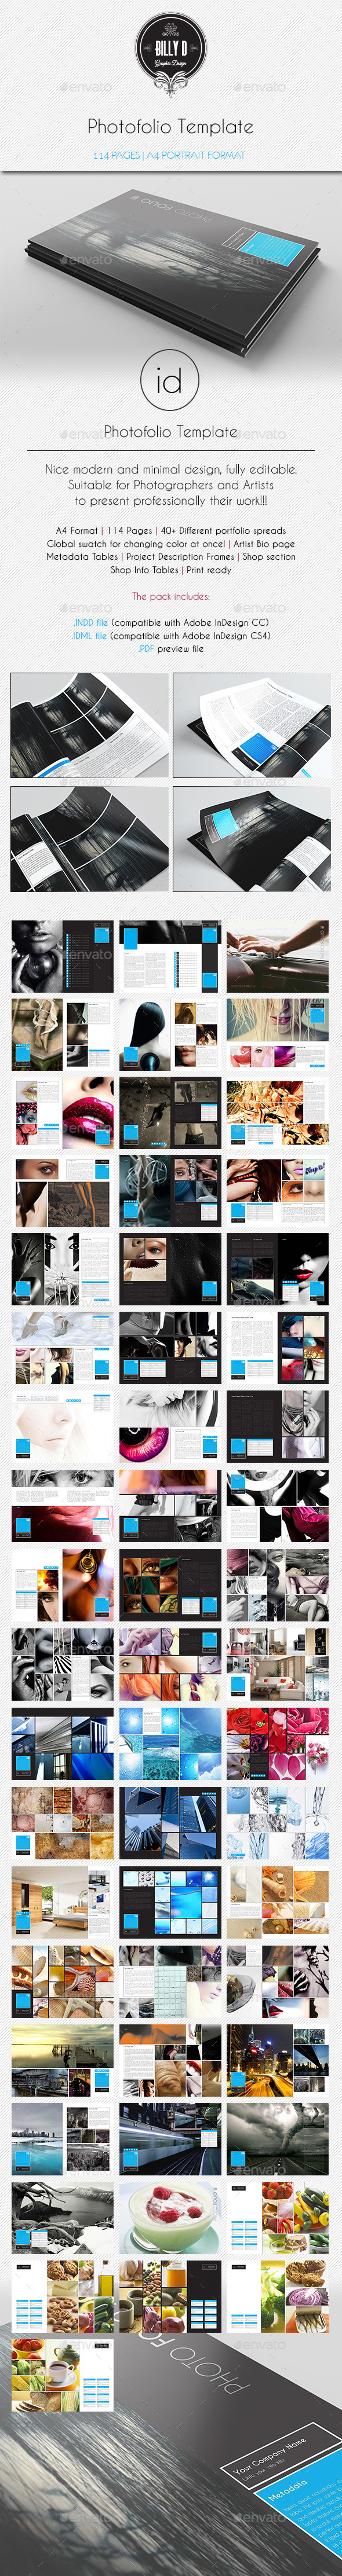 GraphicRiver Photofolio Template 10102939